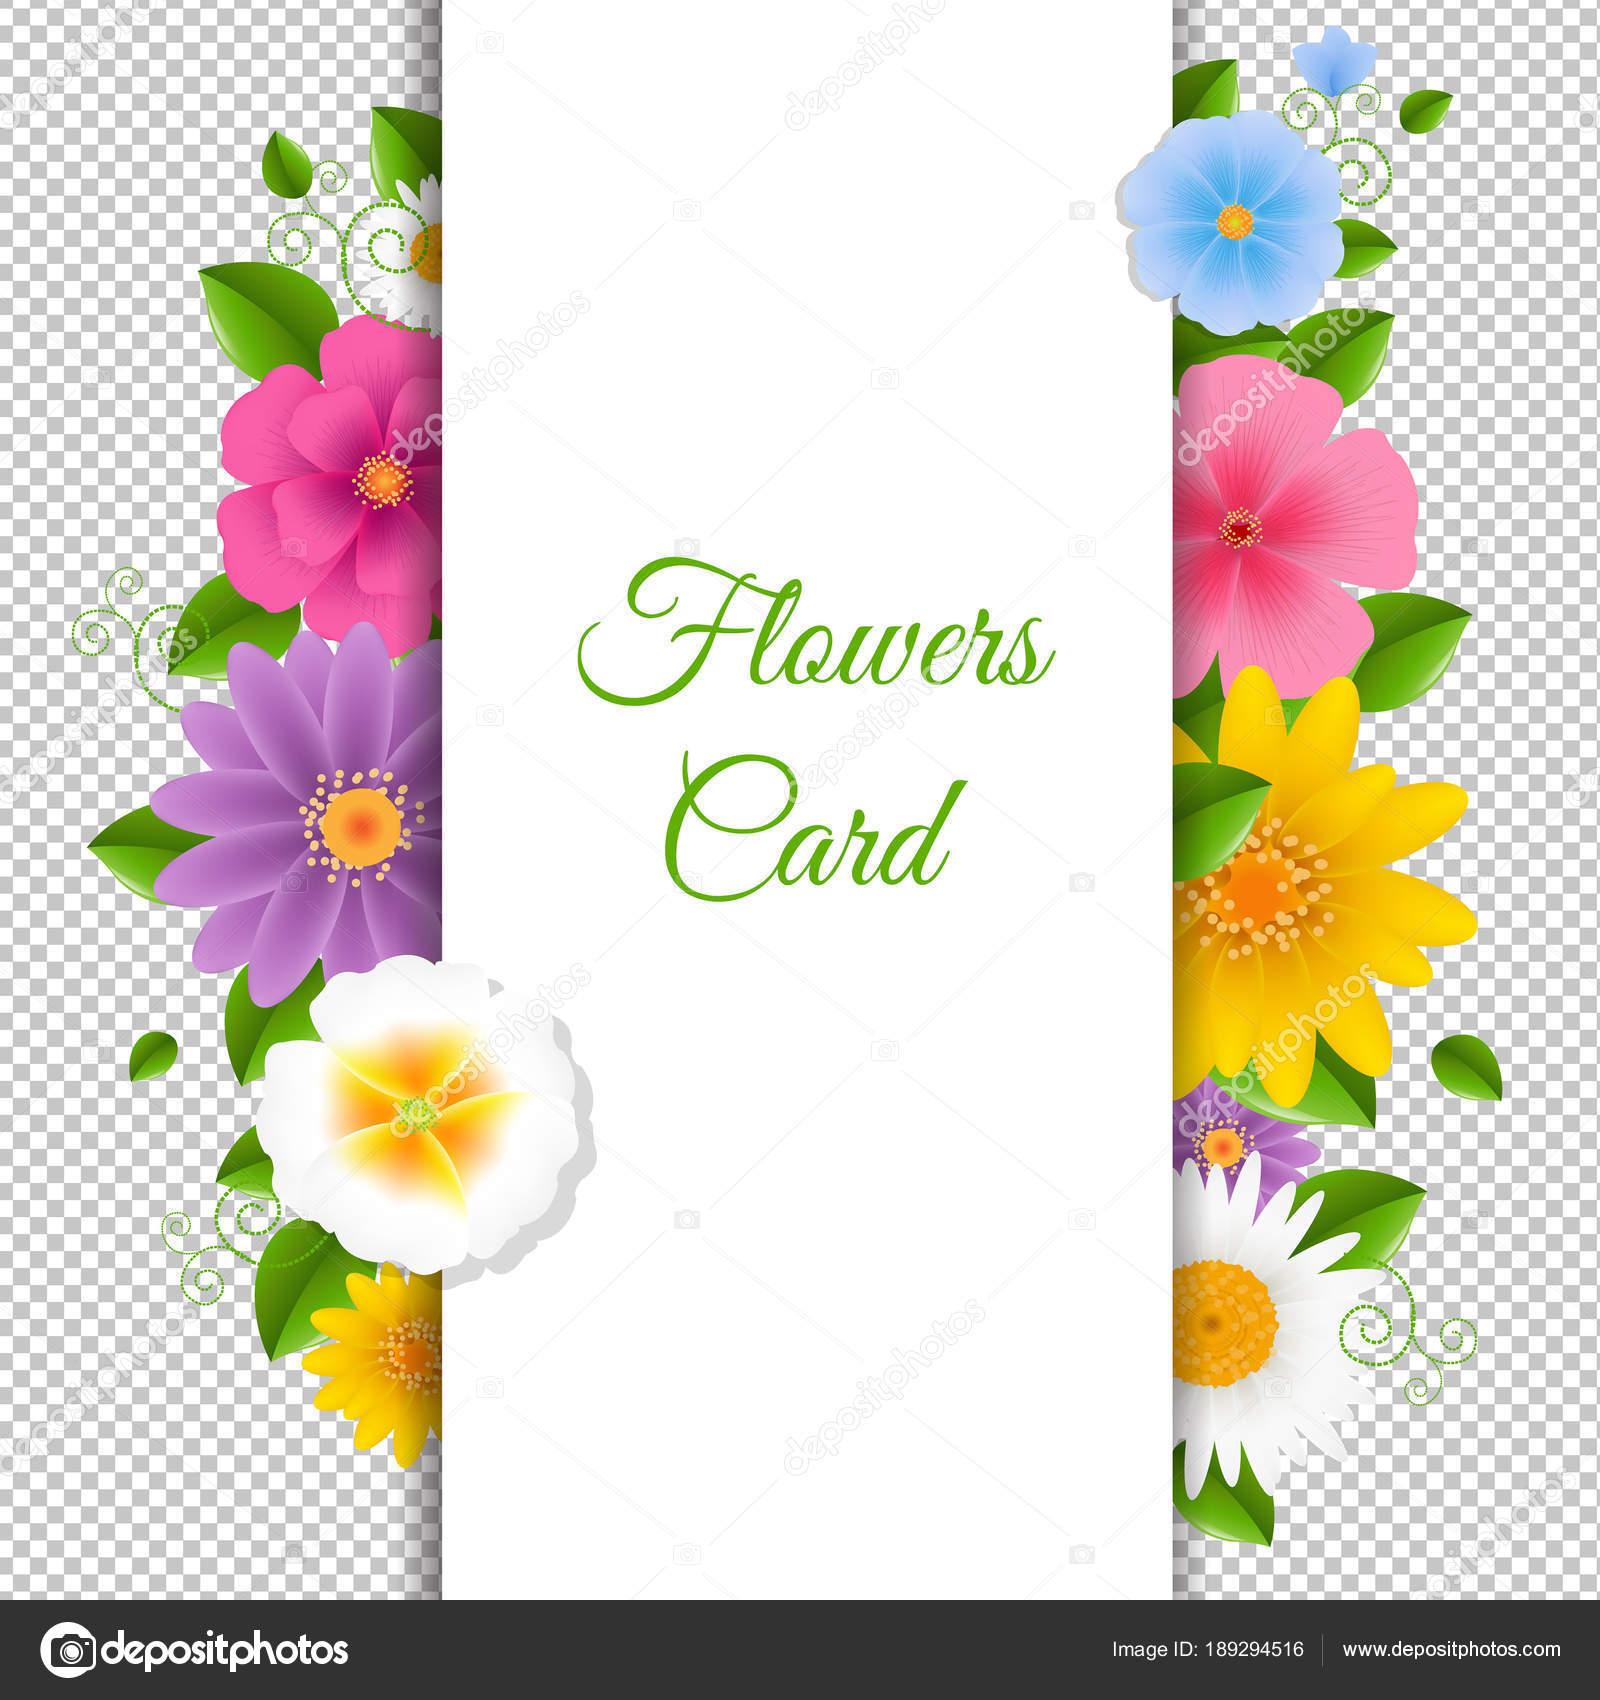 Card flowers happy birthday card gradient mesh vector illustration card flowers happy birthday card gradient mesh vector illustration stock vector izmirmasajfo